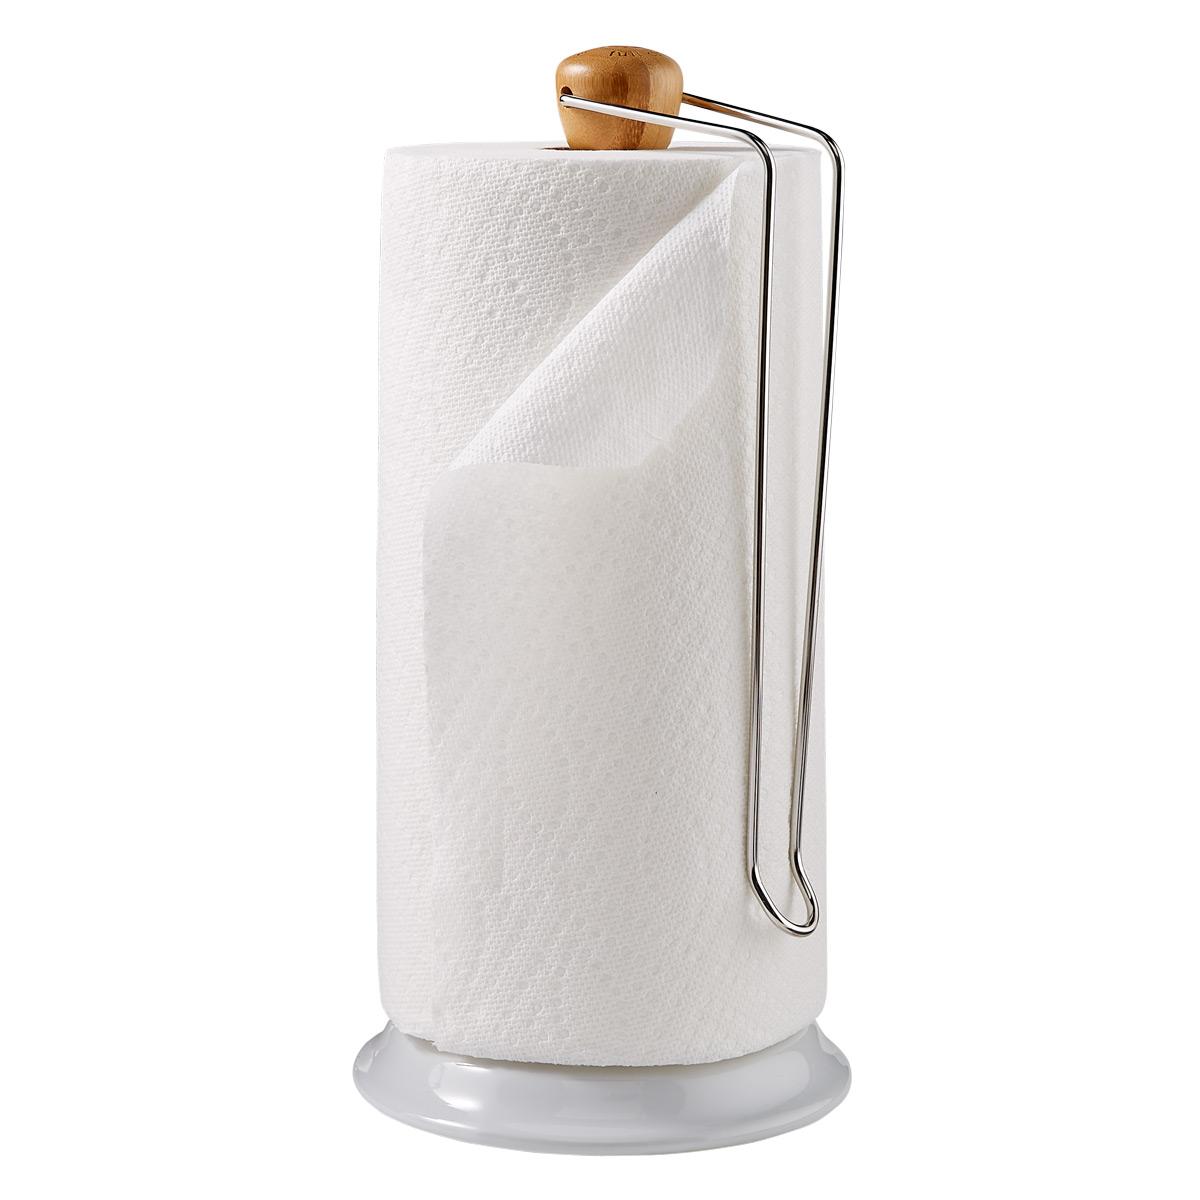 Full Circle Bamboo & Silver Paper Towel Holder